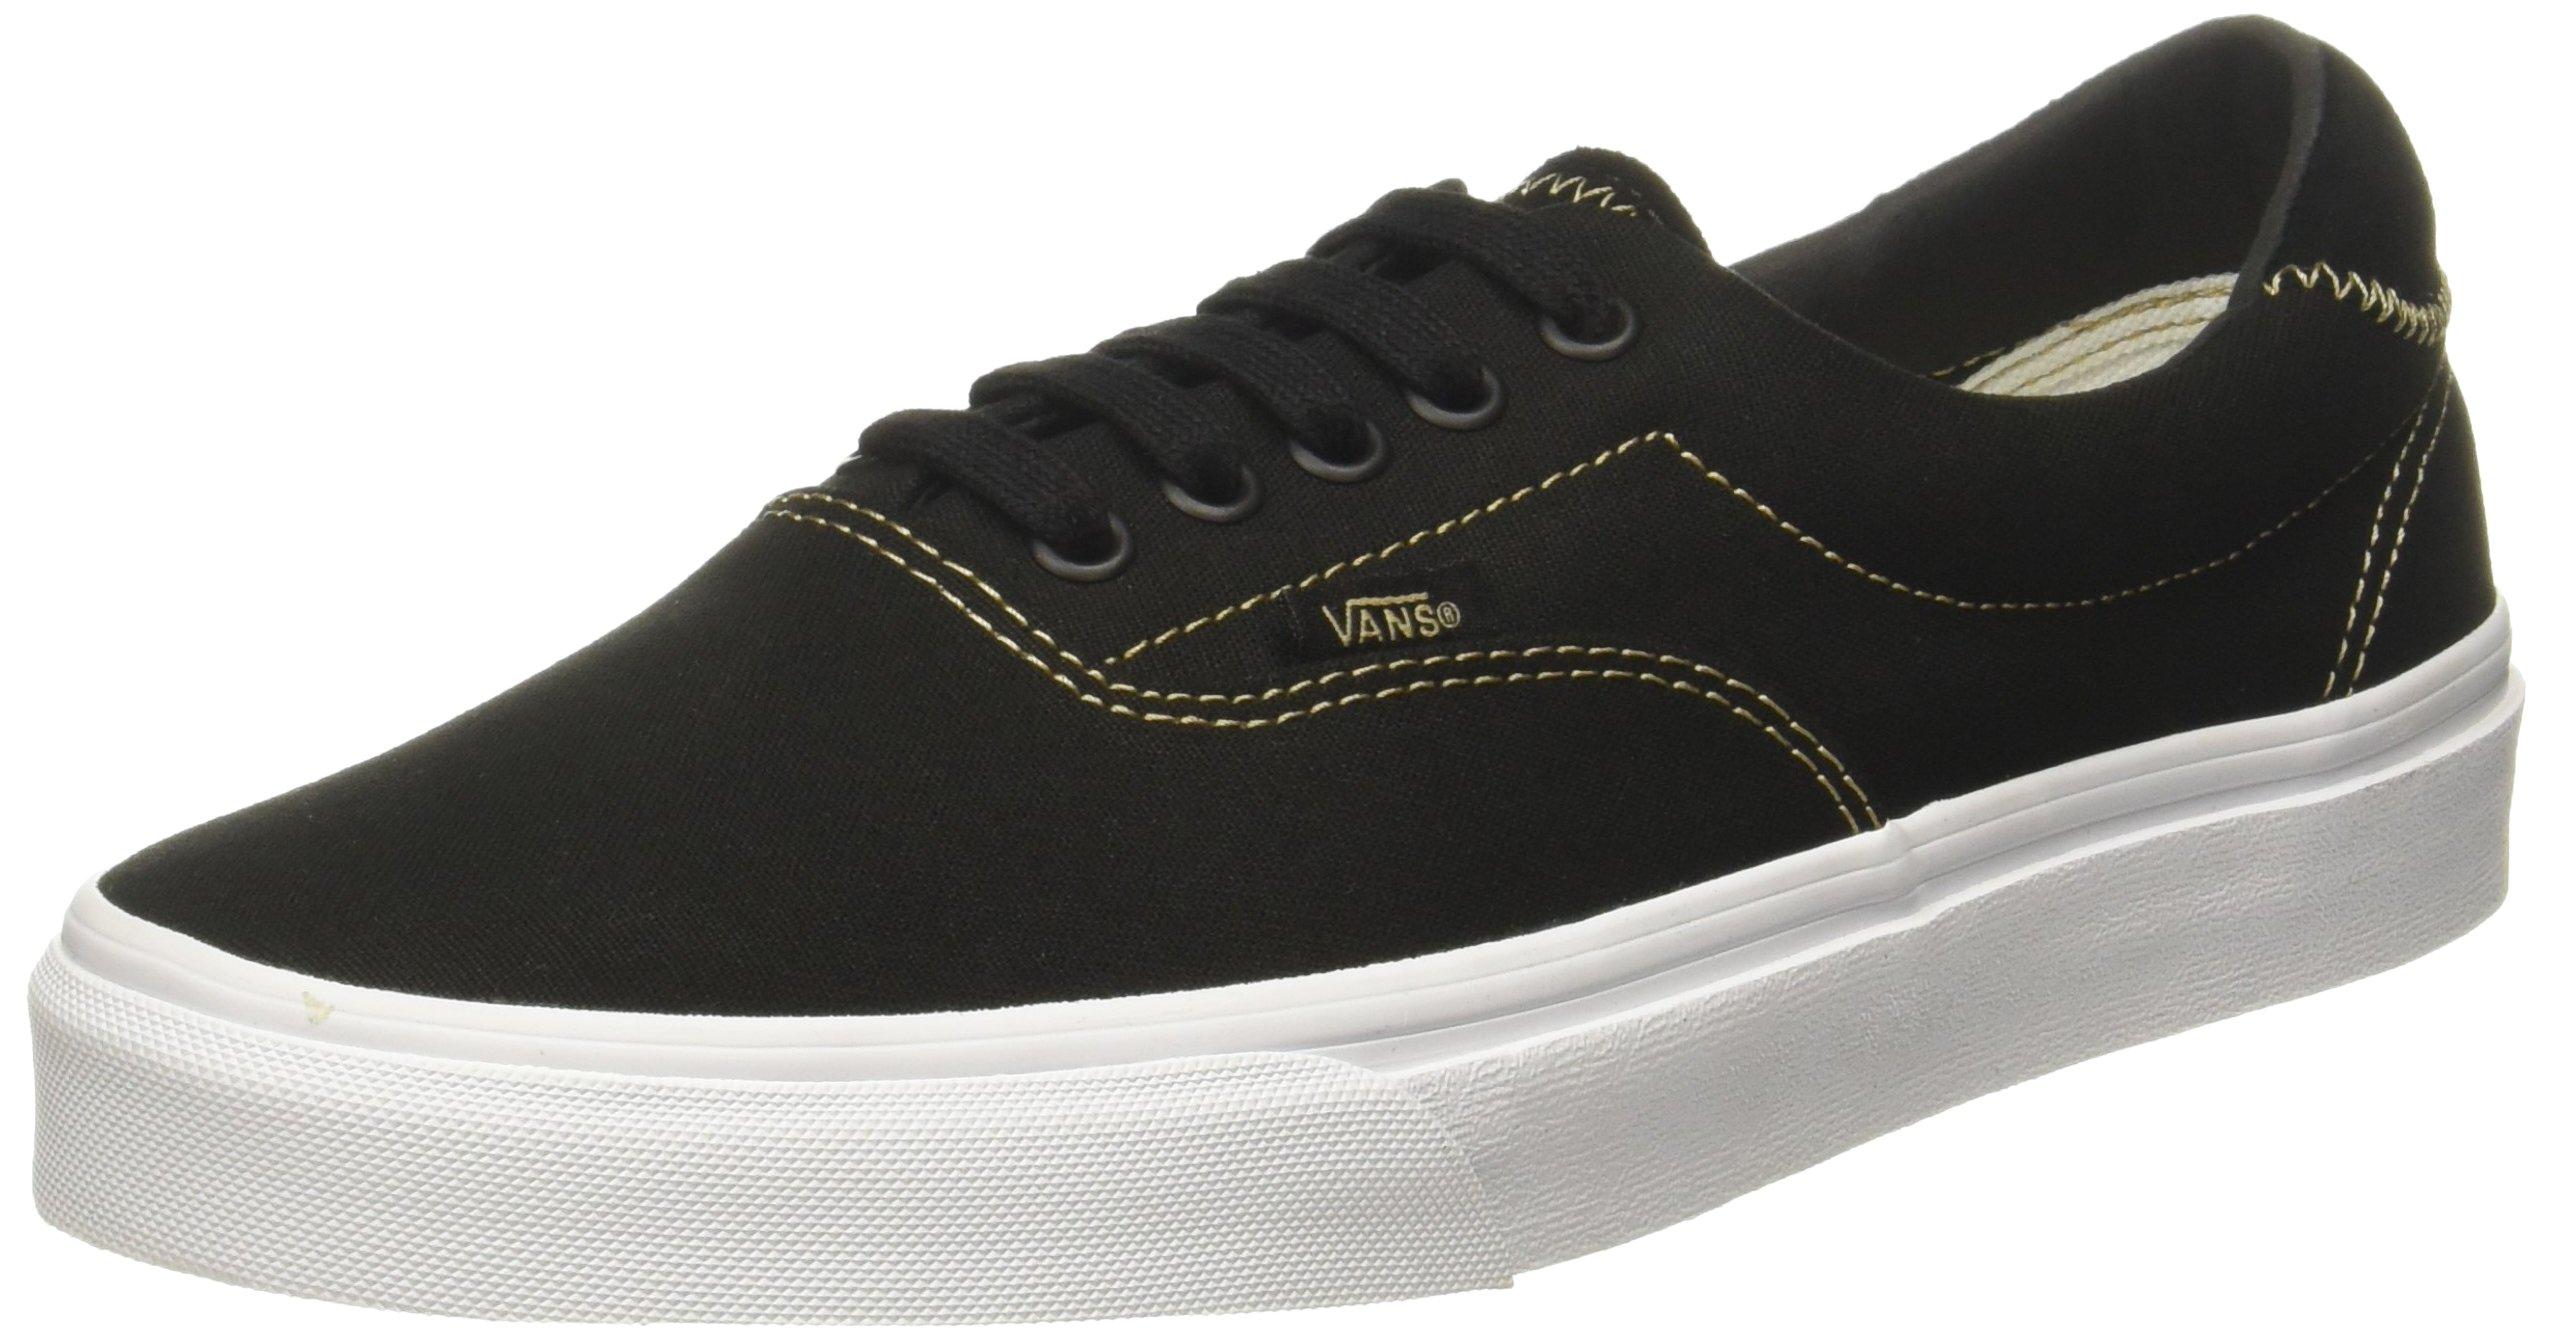 b74aa506dc Galleon - Vans Era 59 (C S) Mens Fashion-sneakers VN-A38FSMVG 8 - Black Sand